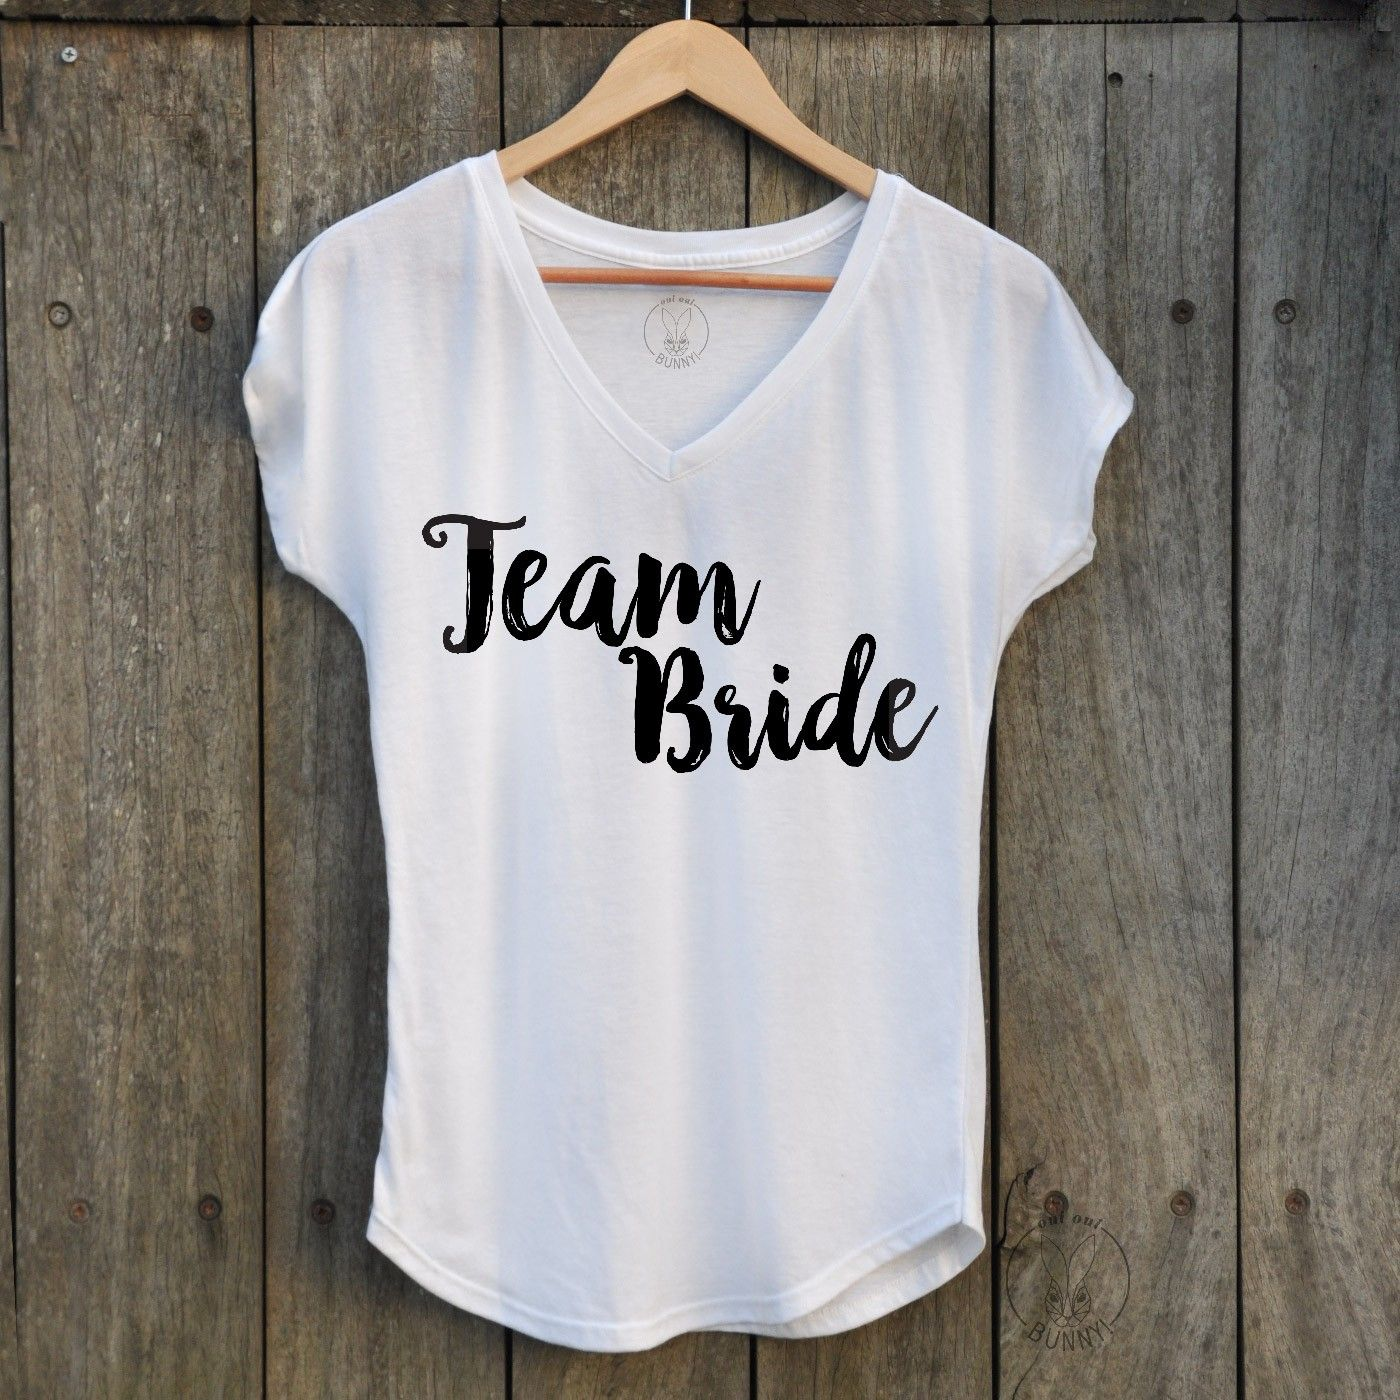 c35002512ce T-Shirt Team Bride - T-shirts - EVJF - Oui Oui Bunny   Mariage